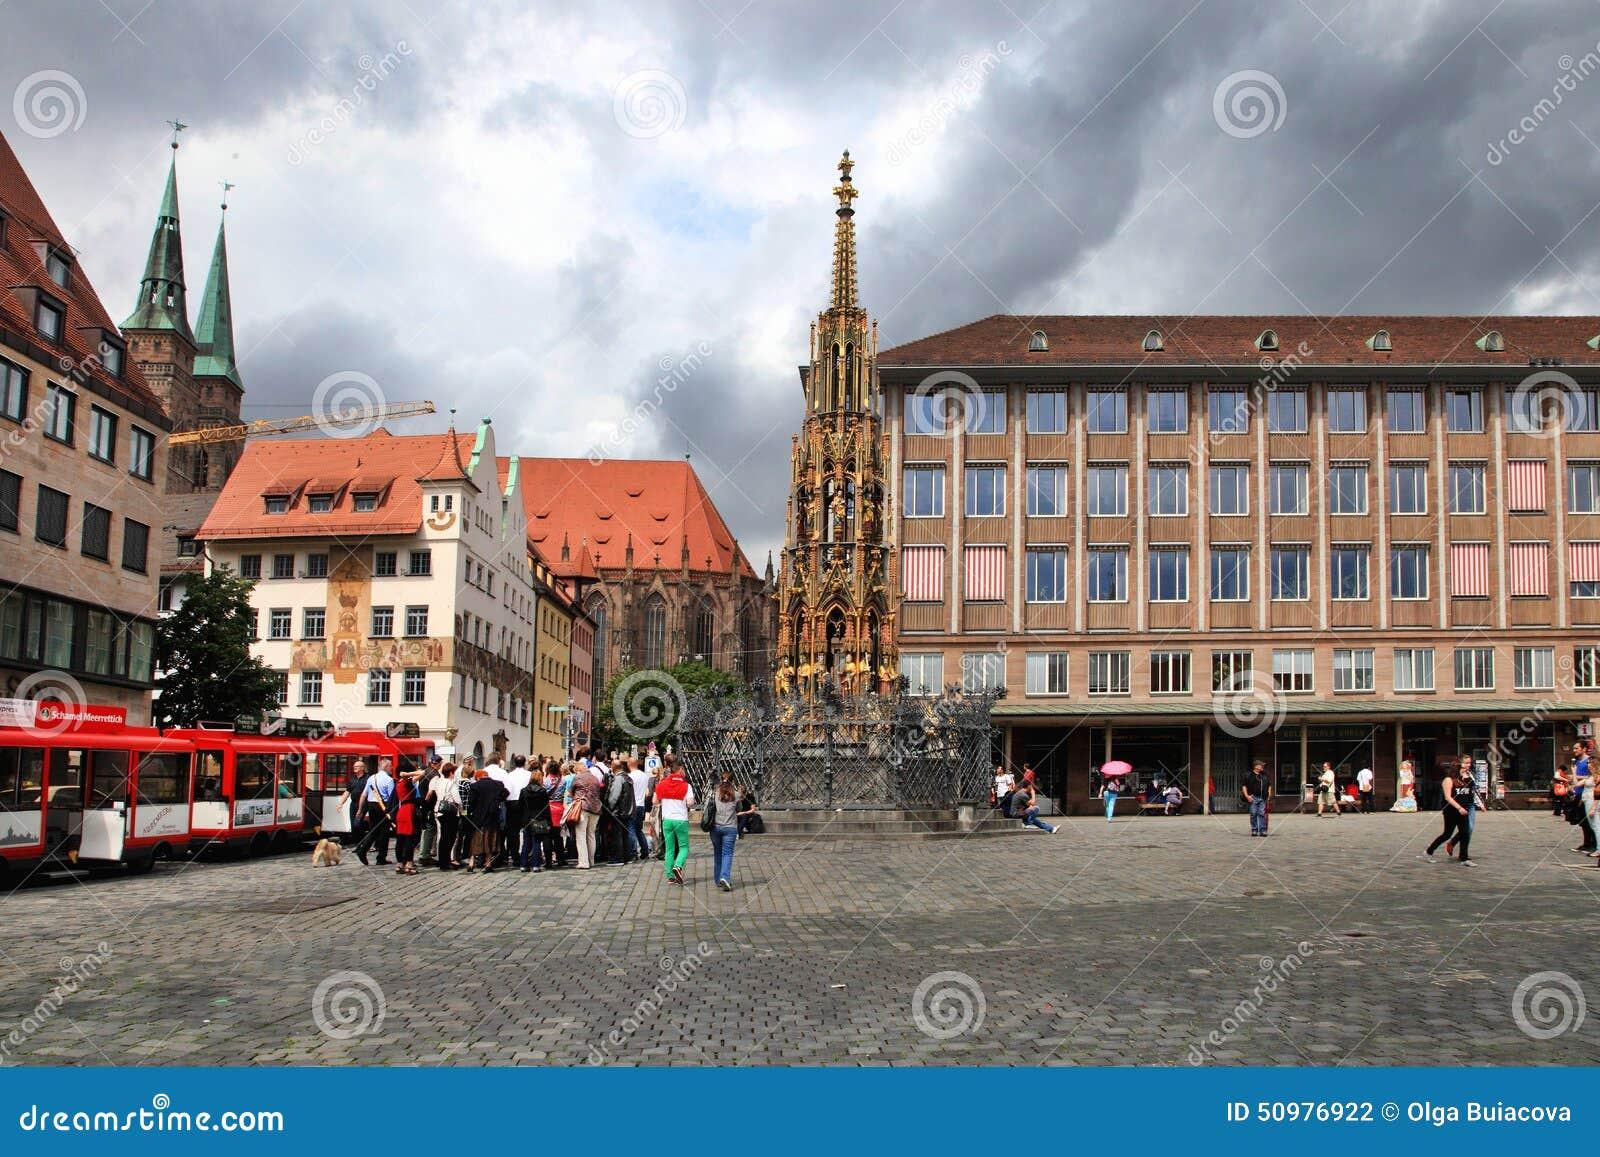 NURNBERG, GERMANIA - 13 LUGLIO 2014: Hauptmarkt, il quadrato centrale